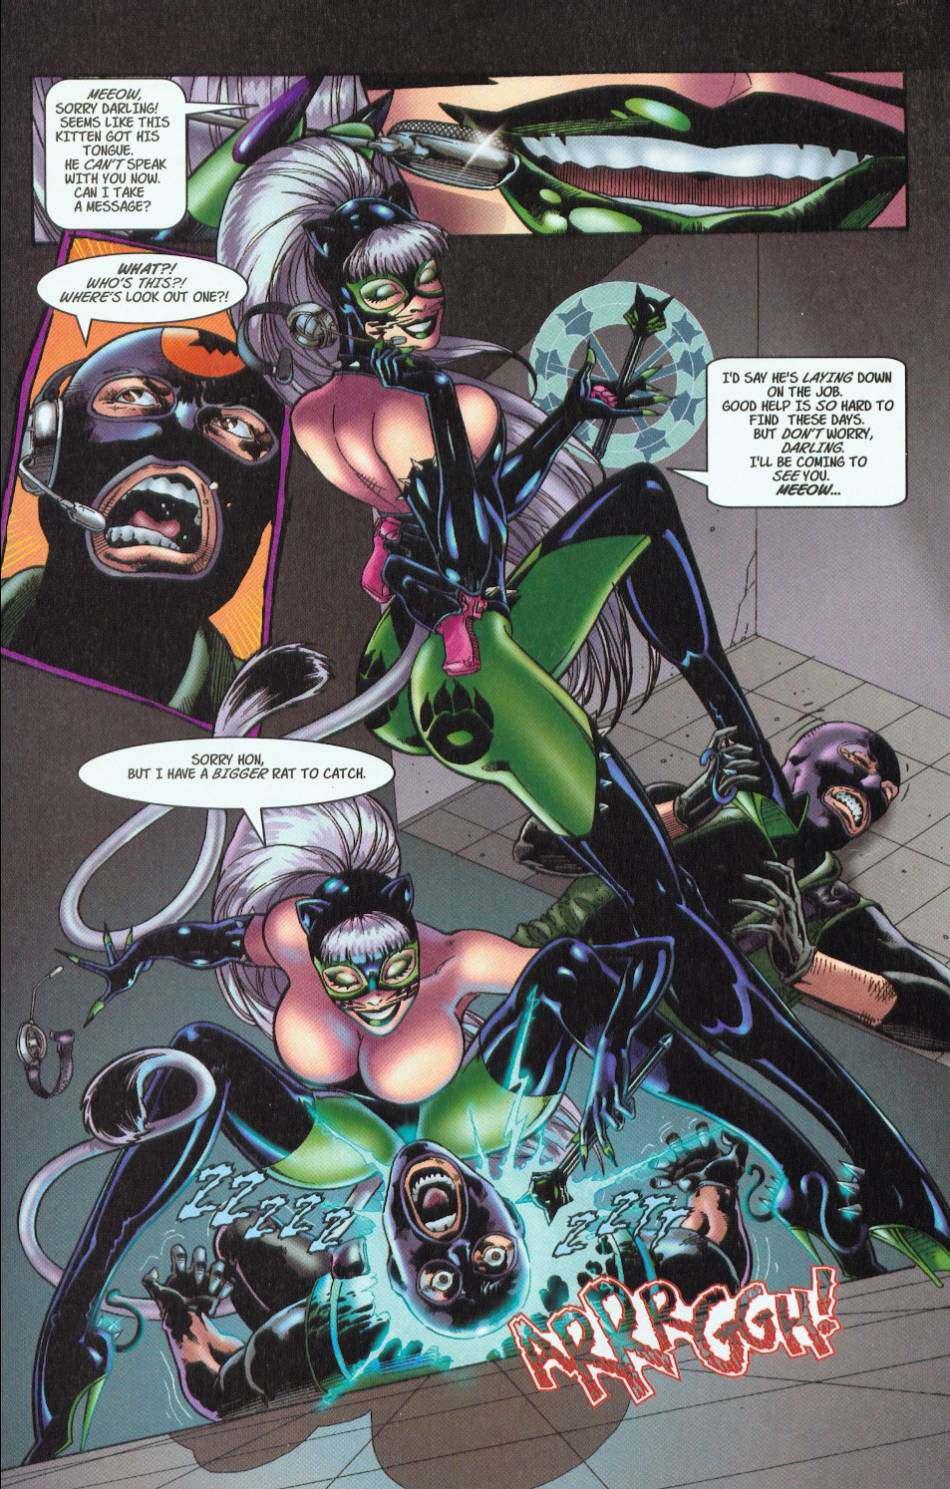 Read online 3 Little Kittens: Purrr-fect Weapons comic -  Issue #1 - 7